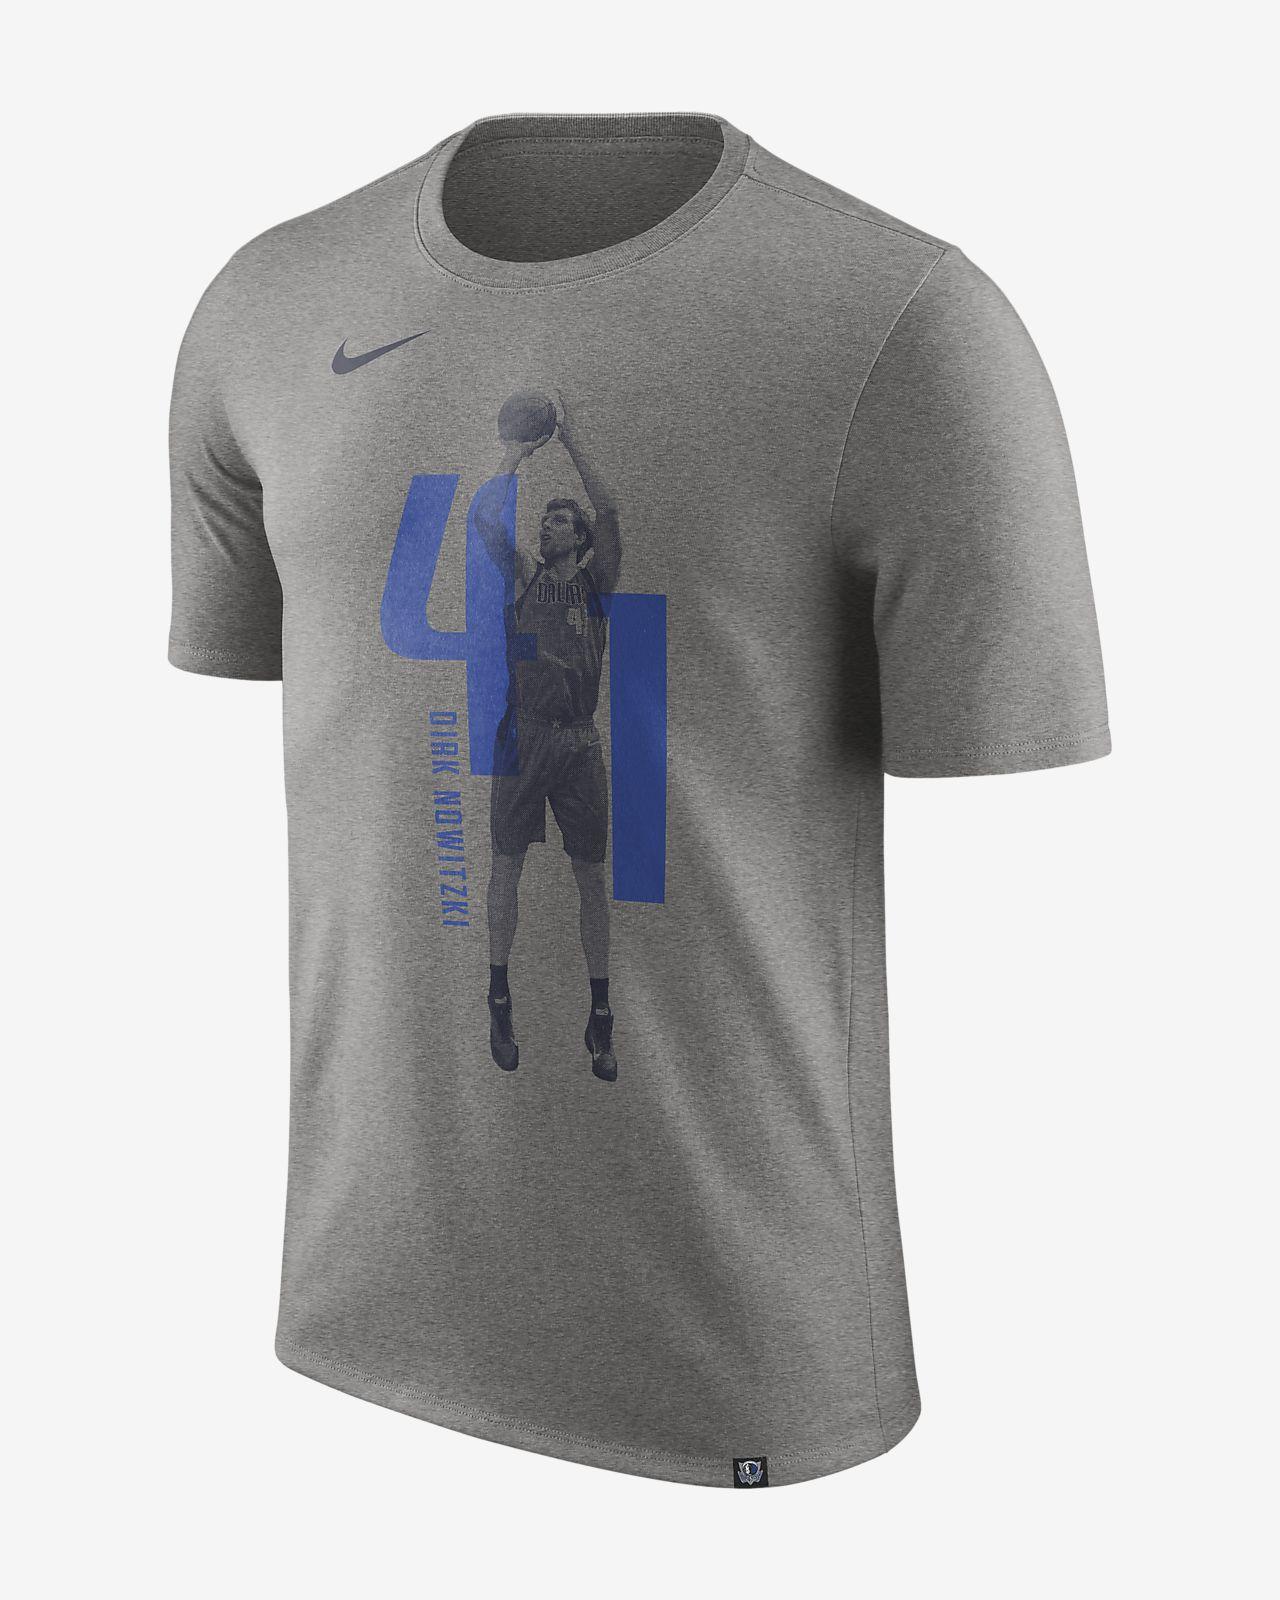 T-shirt NBA Dirk Nowitzki Dallas Mavericks Nike Dry para homem